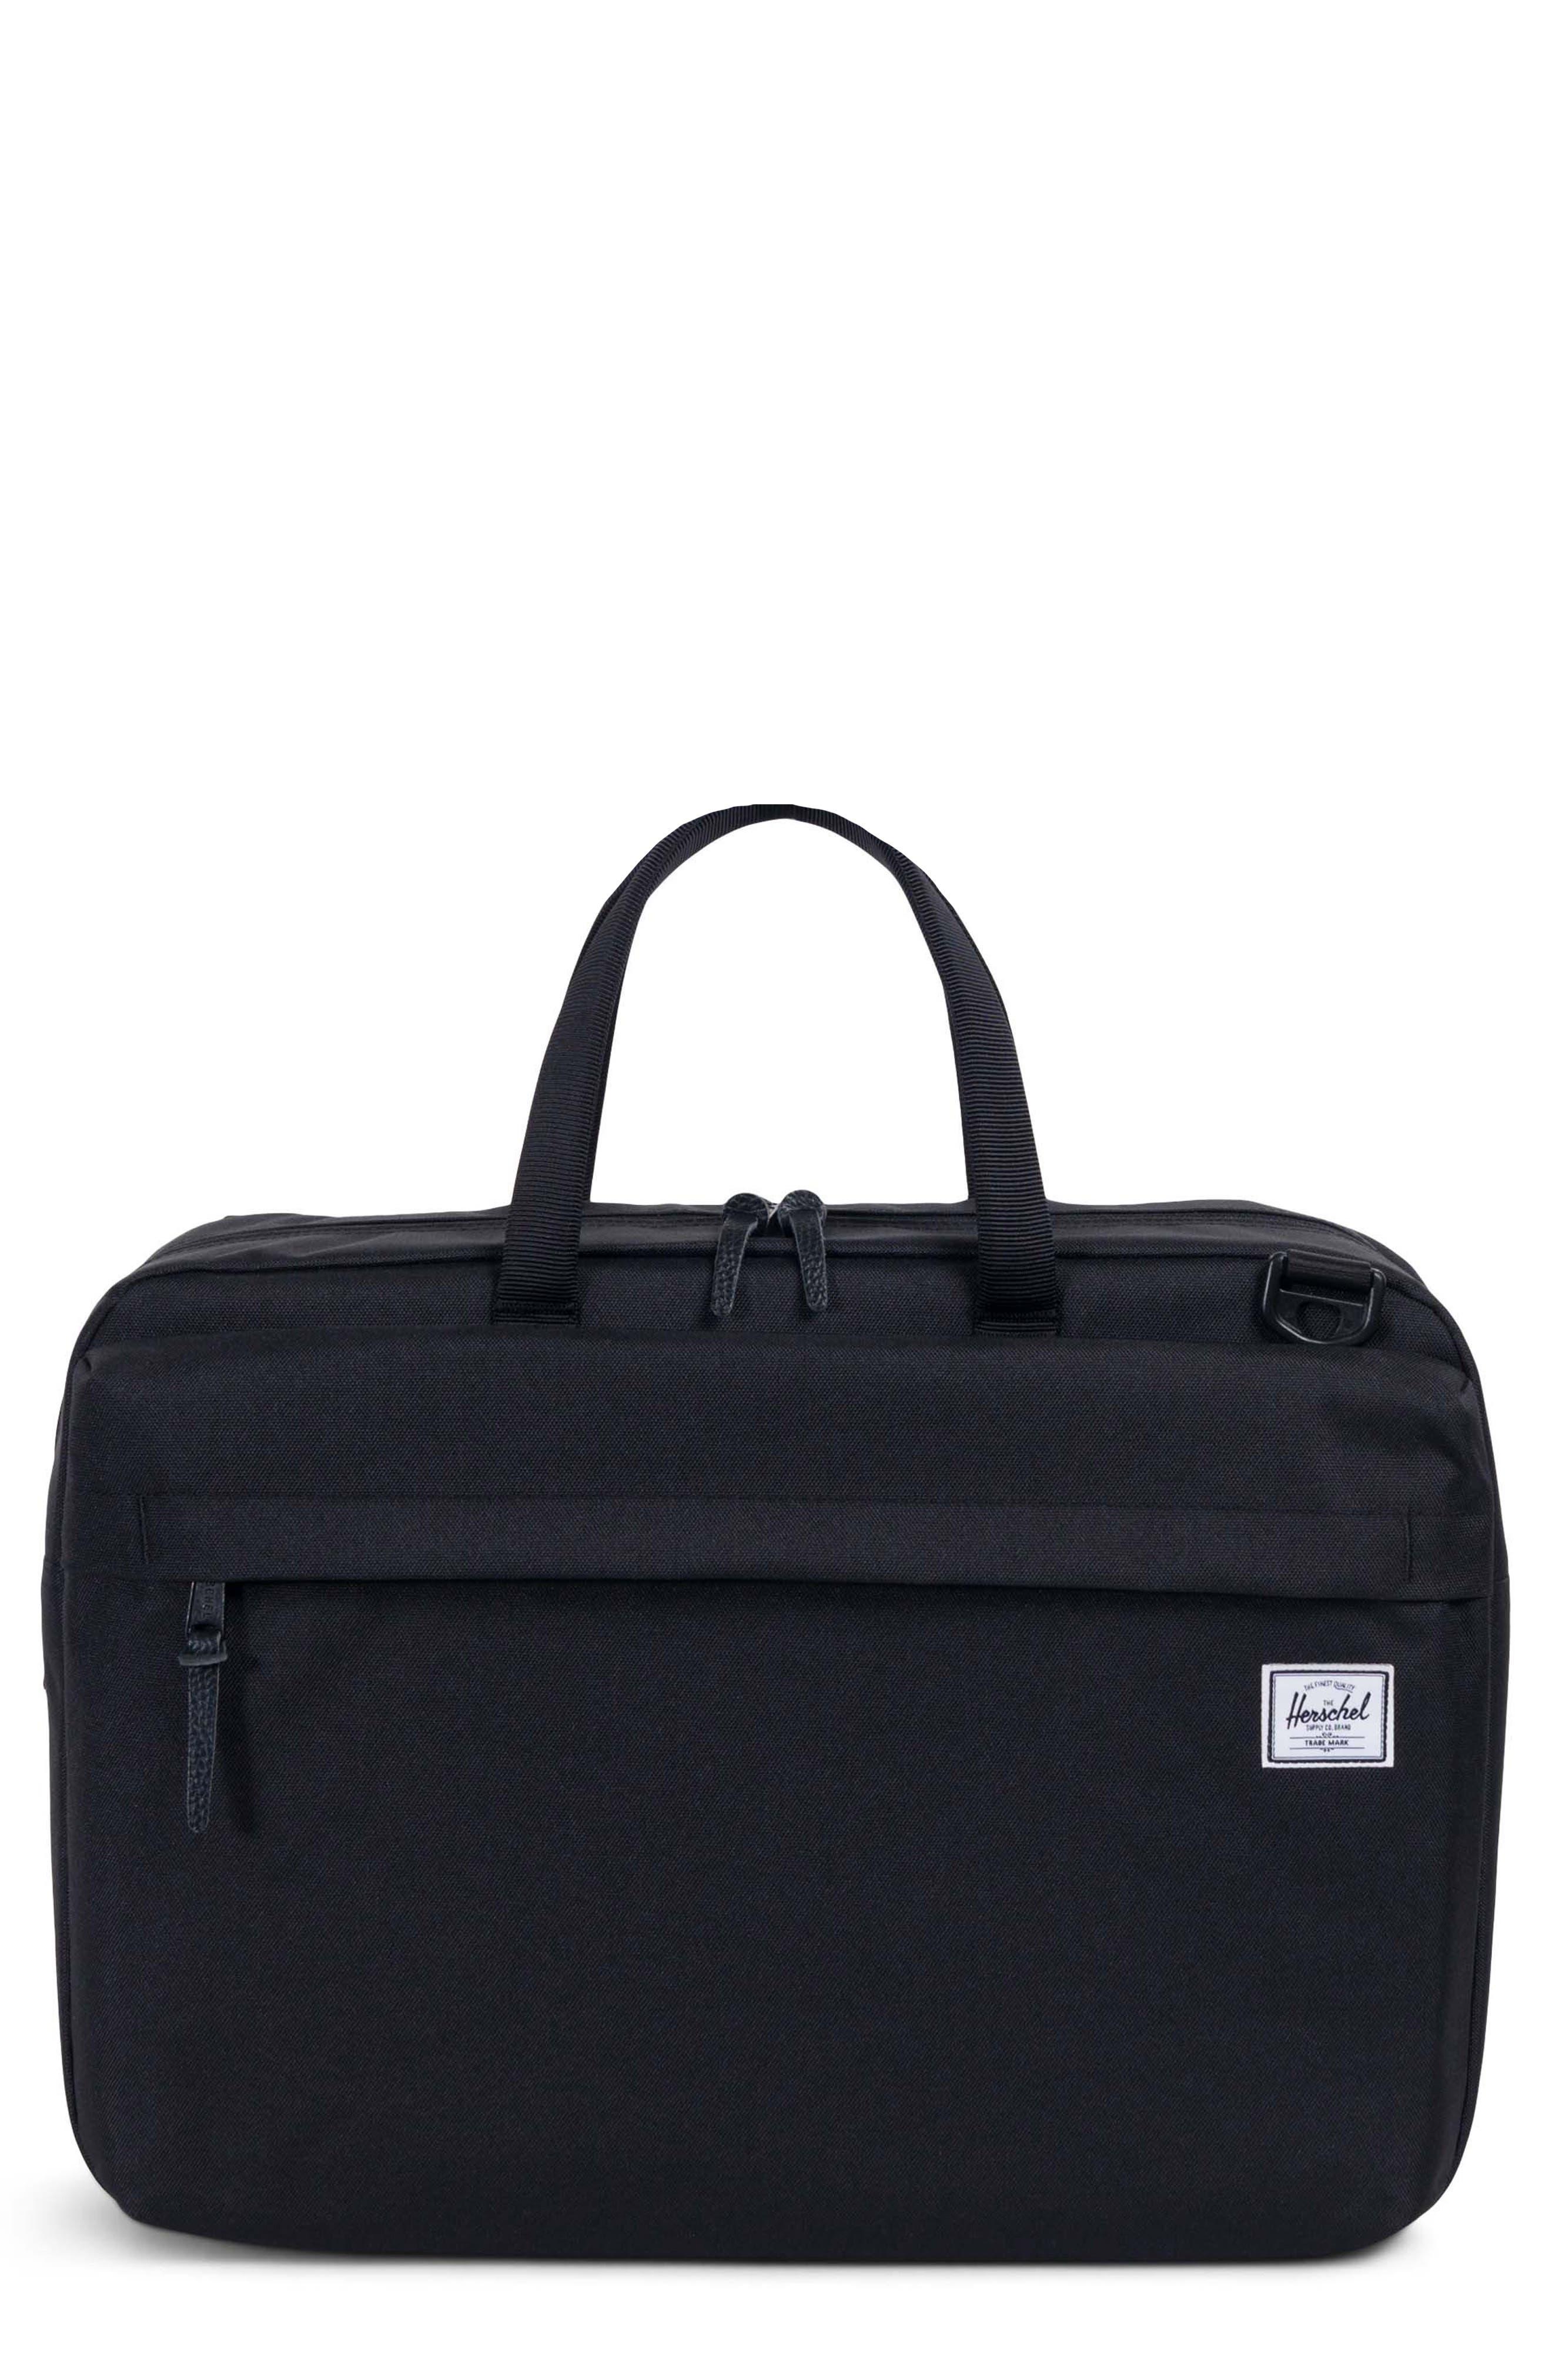 Sandford Messenger Bag,                             Main thumbnail 1, color,                             BLACK